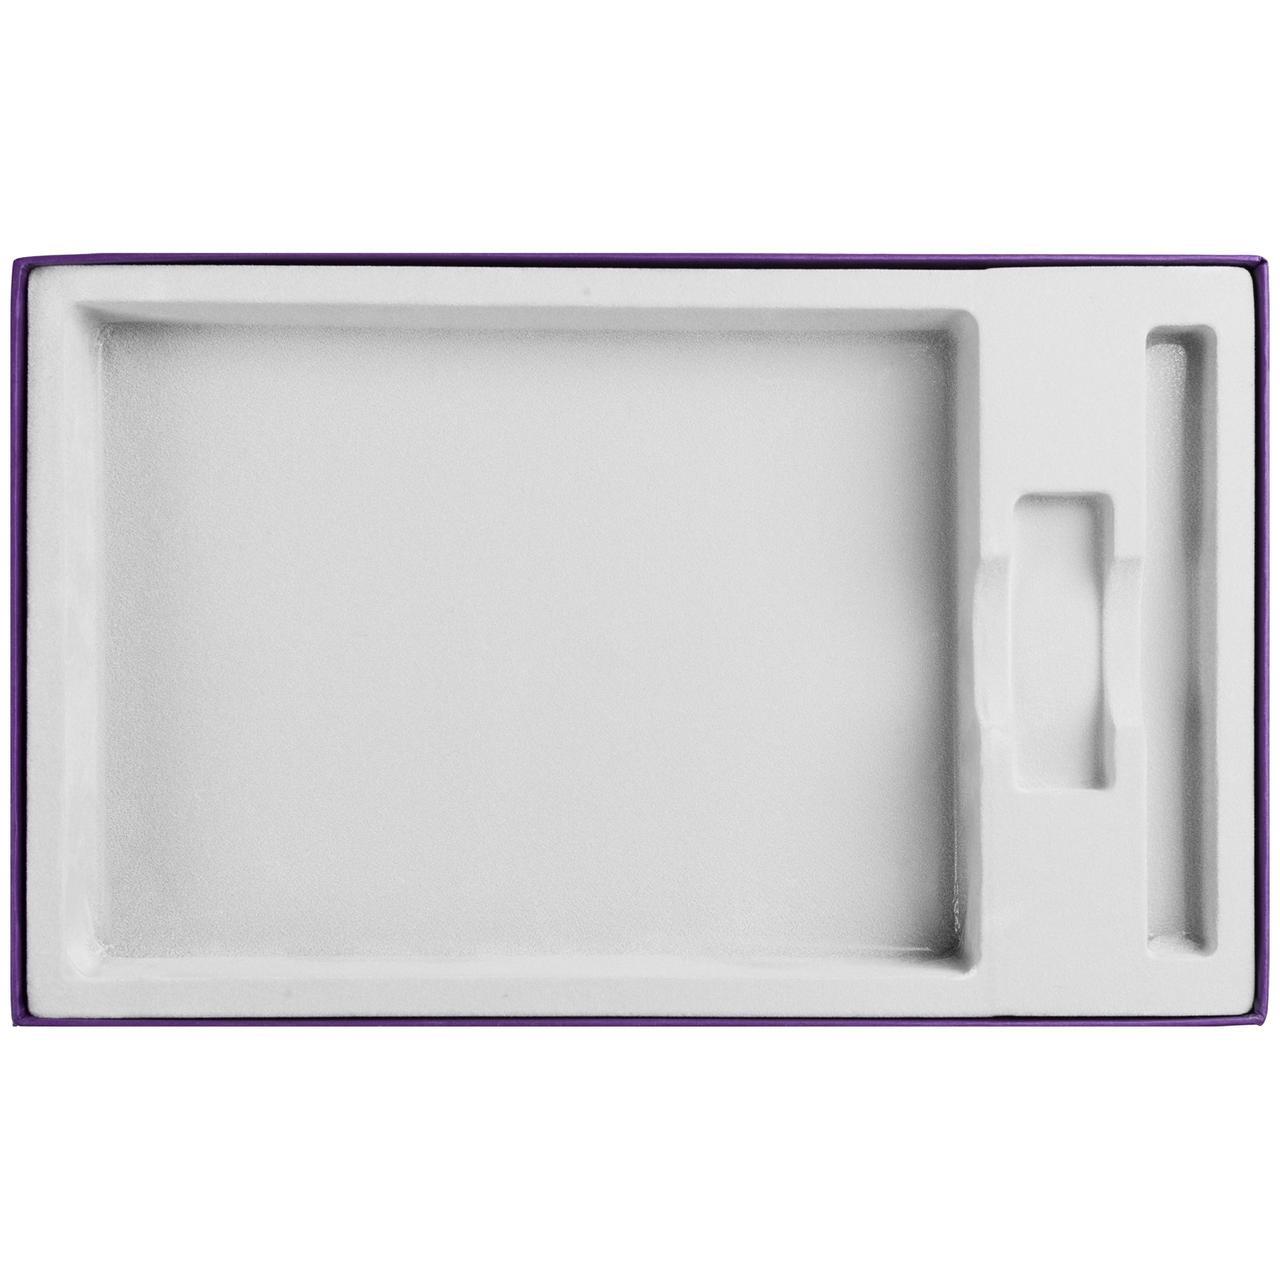 Коробка In Form под ежедневник, флешку, ручку, фиолетовая (артикул 10067.70)